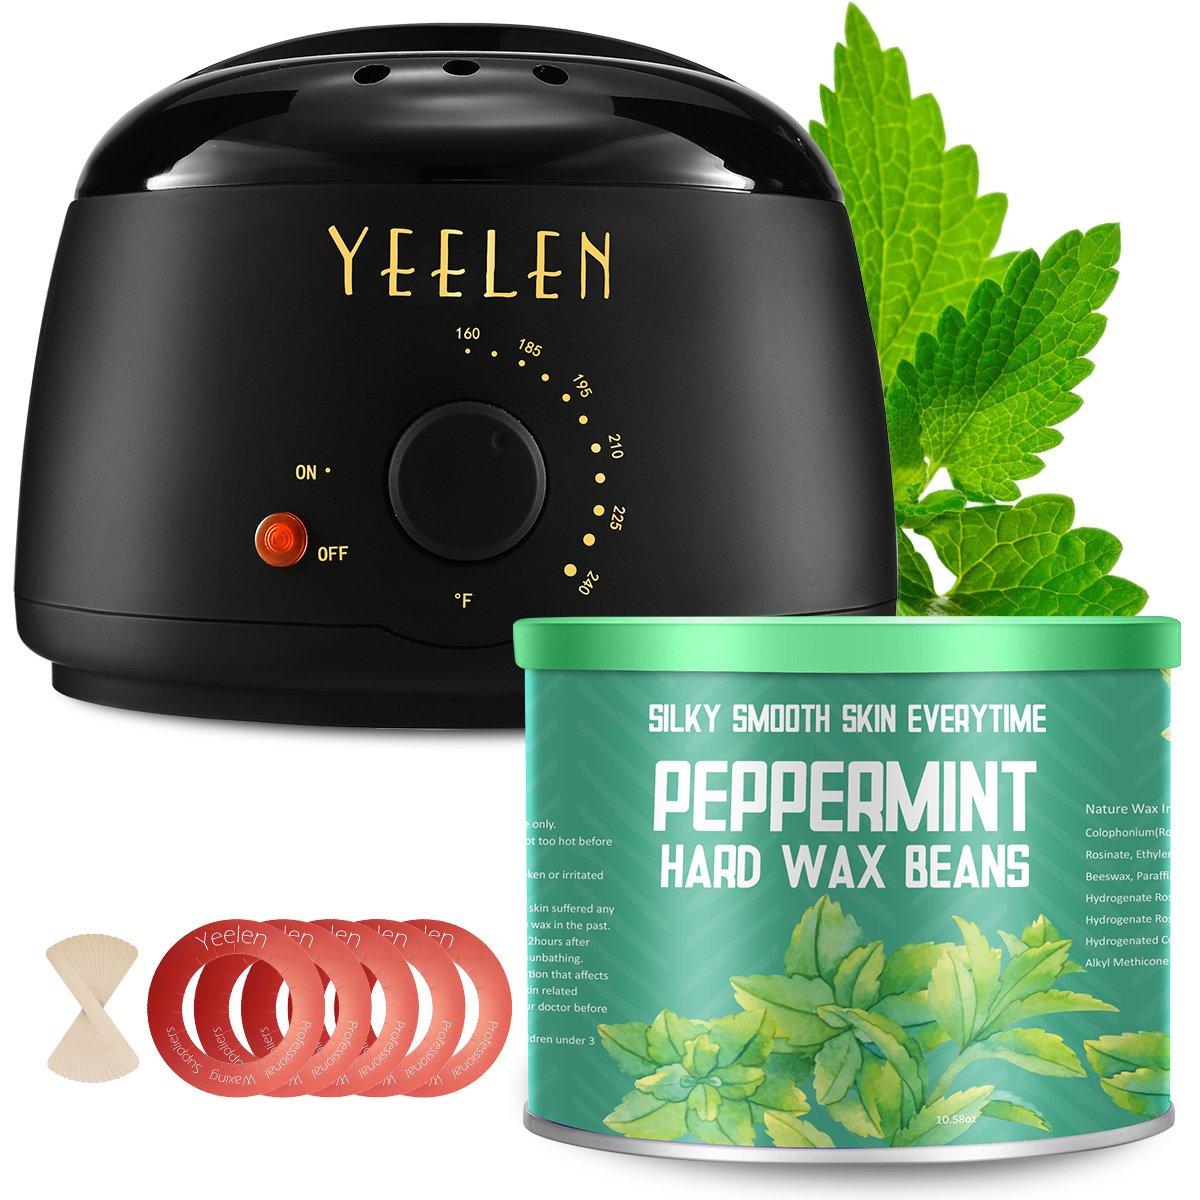 【Peppermint Essential Oil】Yeelen Waxing Kit Hair Removal Wax Warmer with 10.58oz Peppermint Essential Hard Wax Beans, Wax Applicator Sticks and Wax Warmer Collars